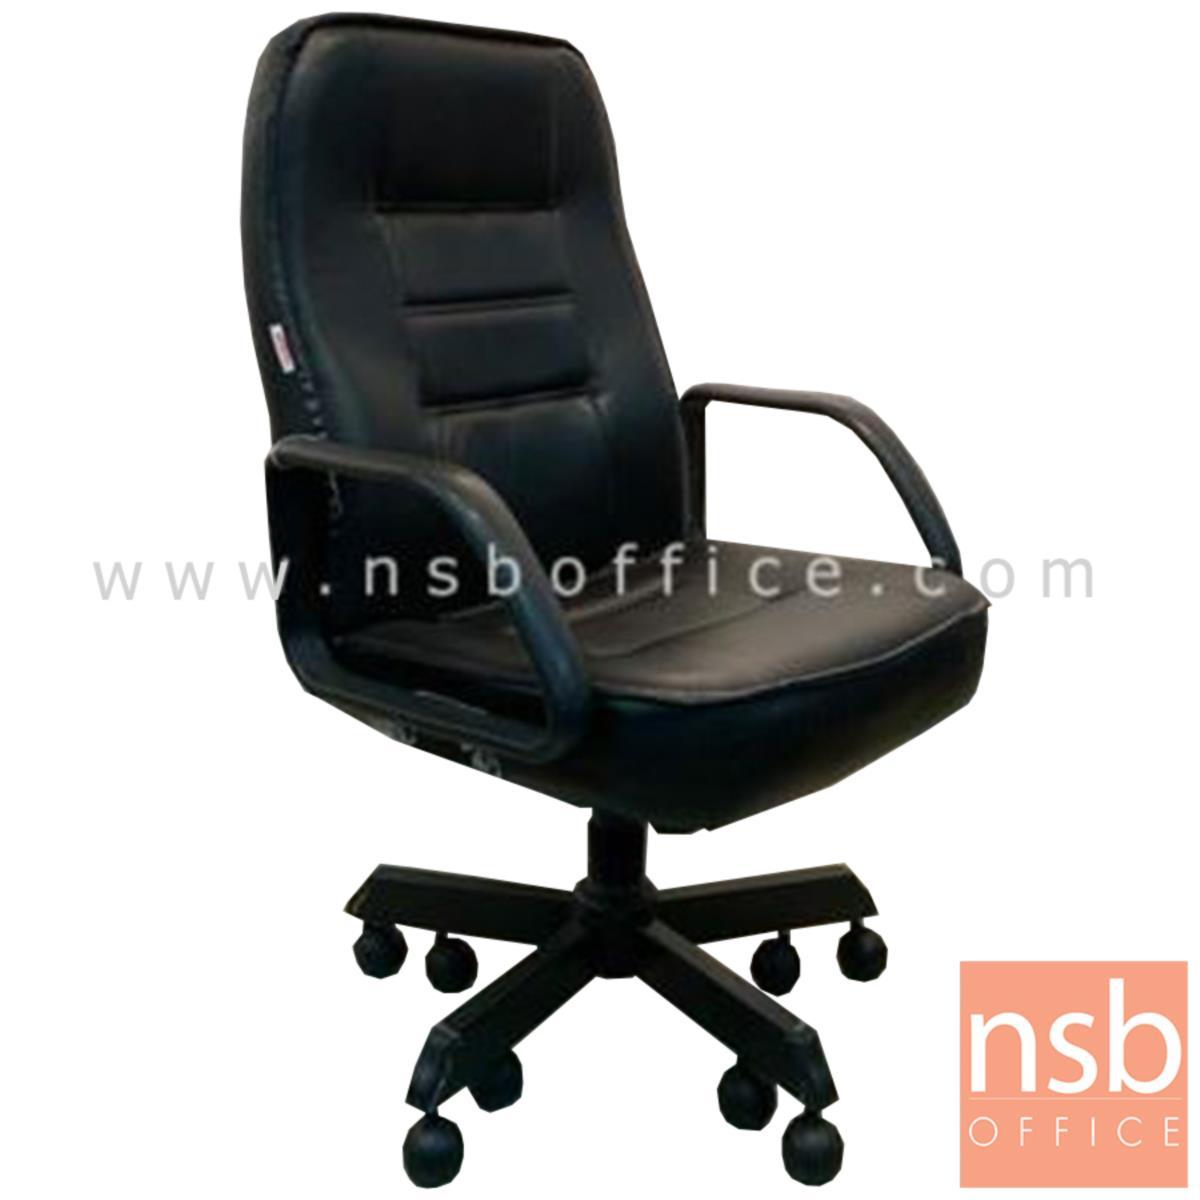 B14A007:เก้าอี้สำนักงาน  รุ่น Modine  มีก้อนโยก ขาเหล็ก 10 ล้อ